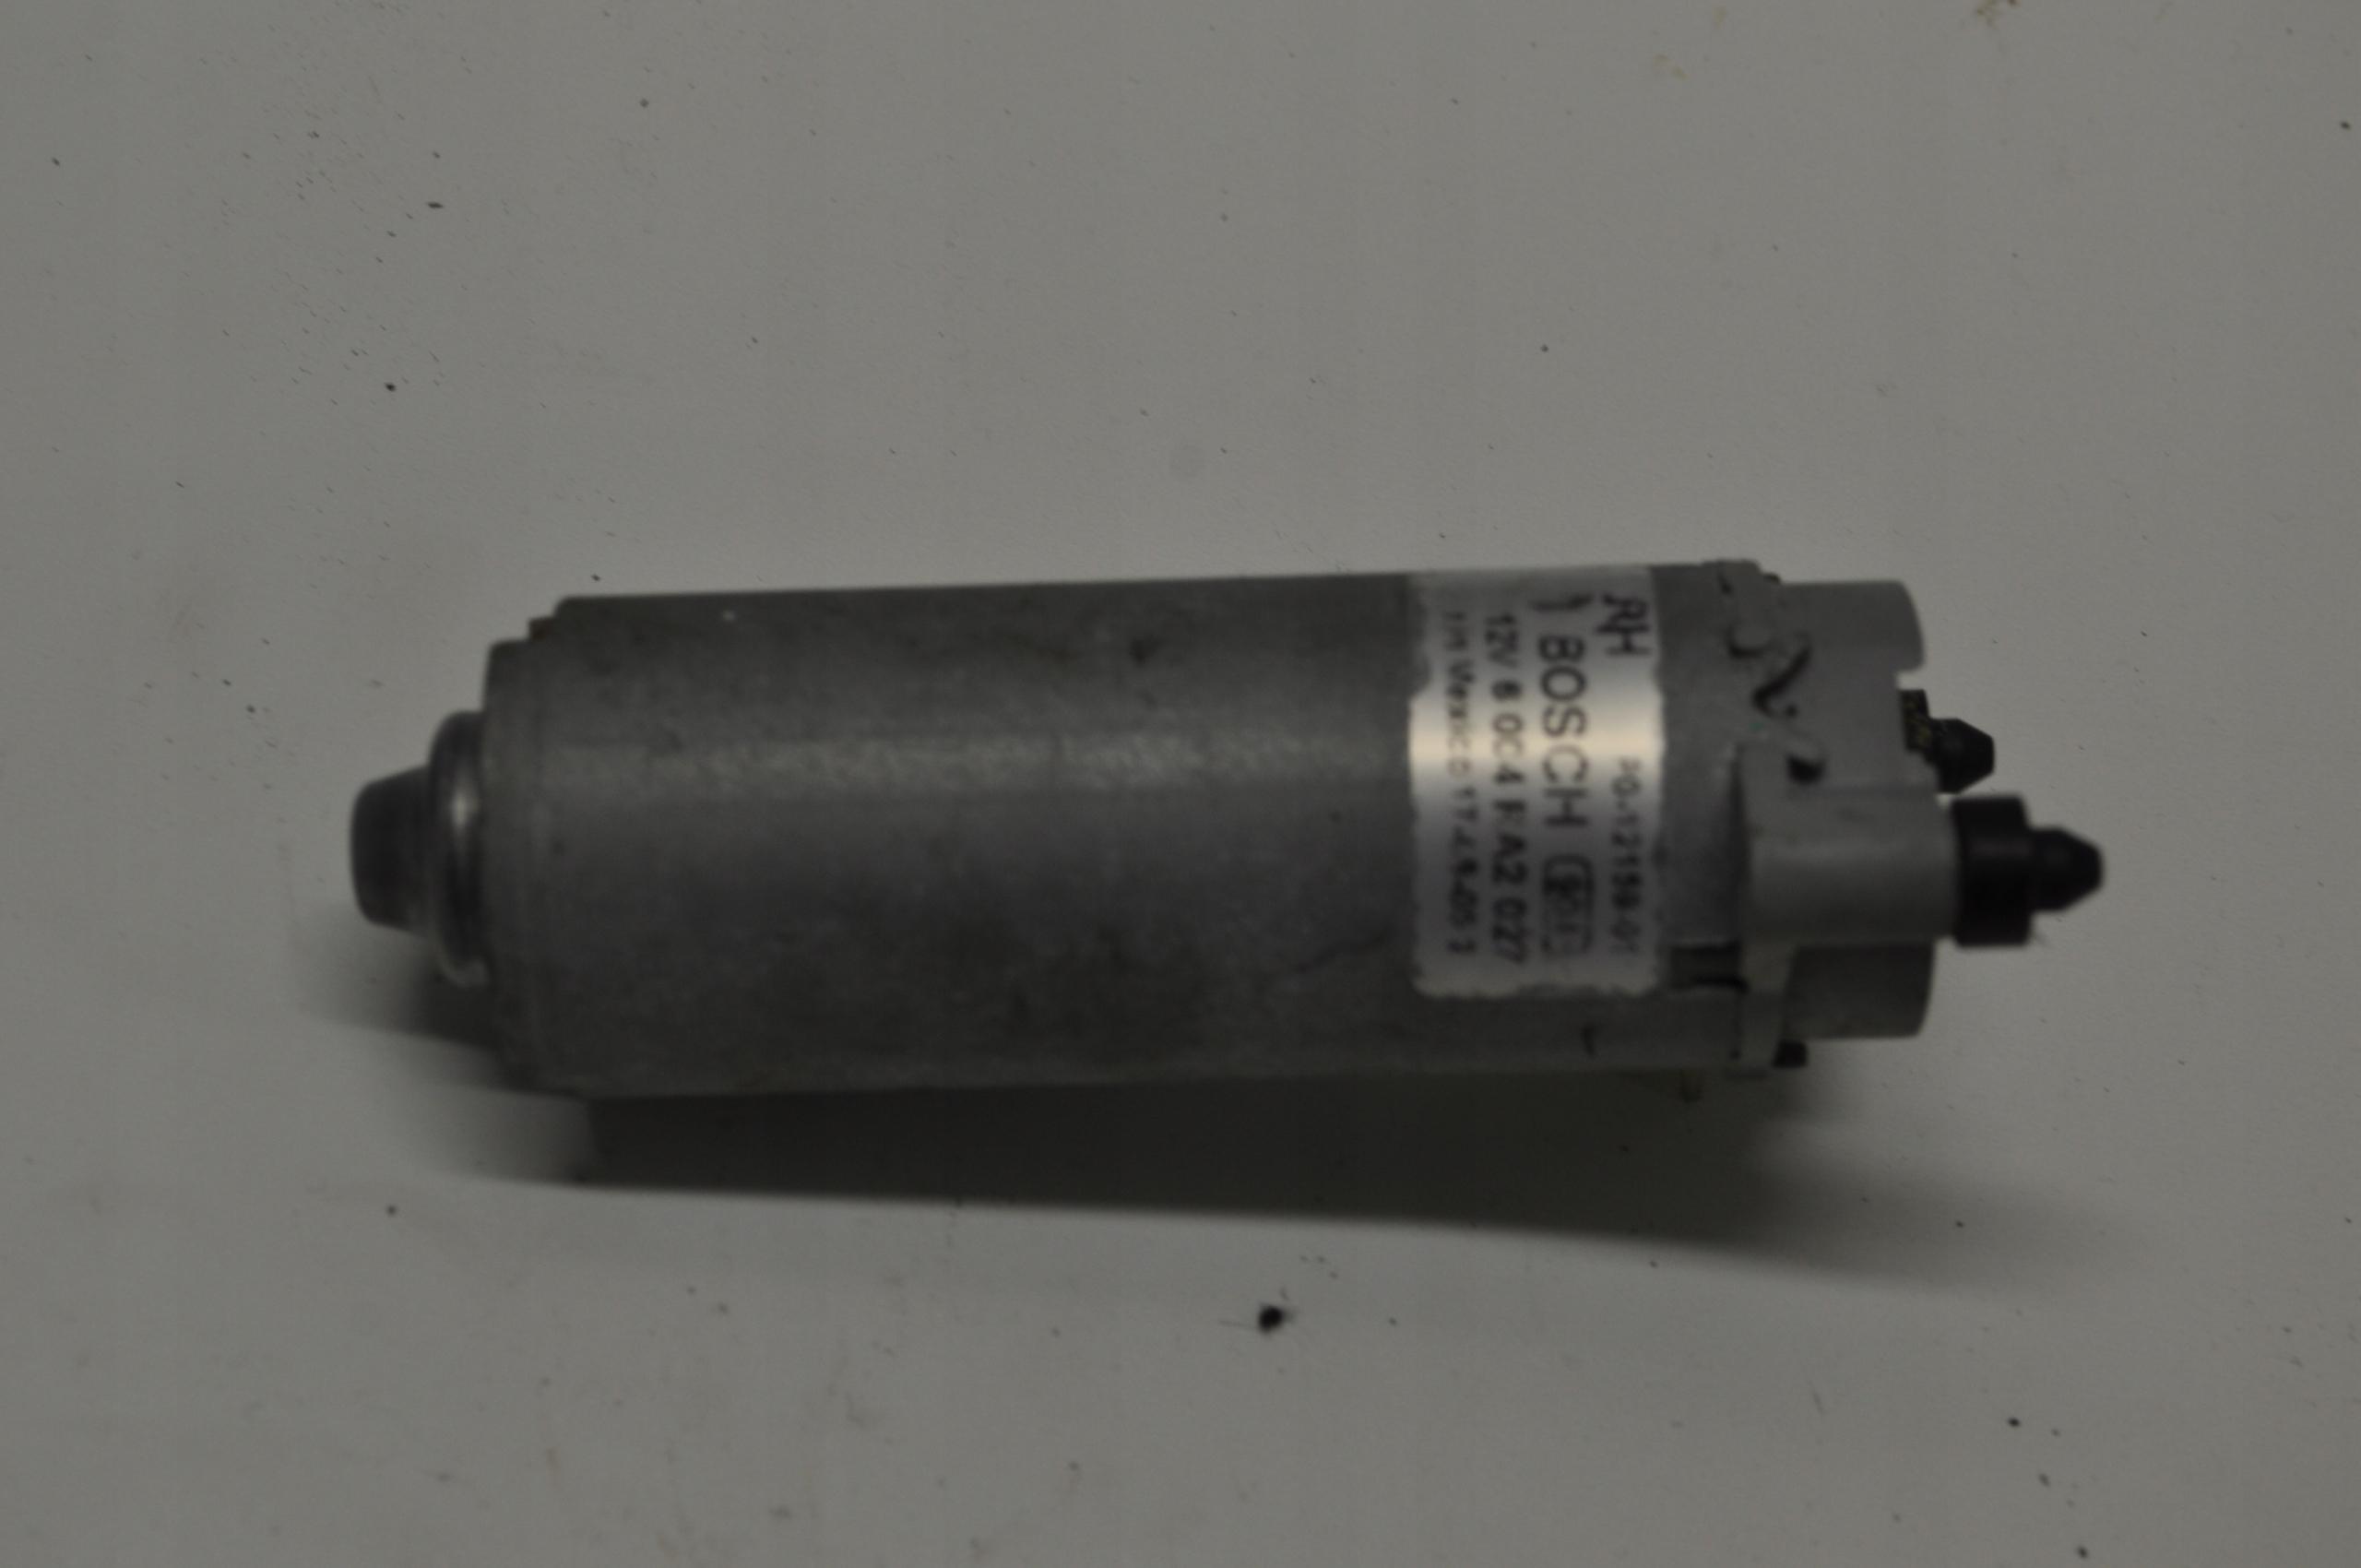 двигатель кресла lp mercedes w211 w164 6004ra2027